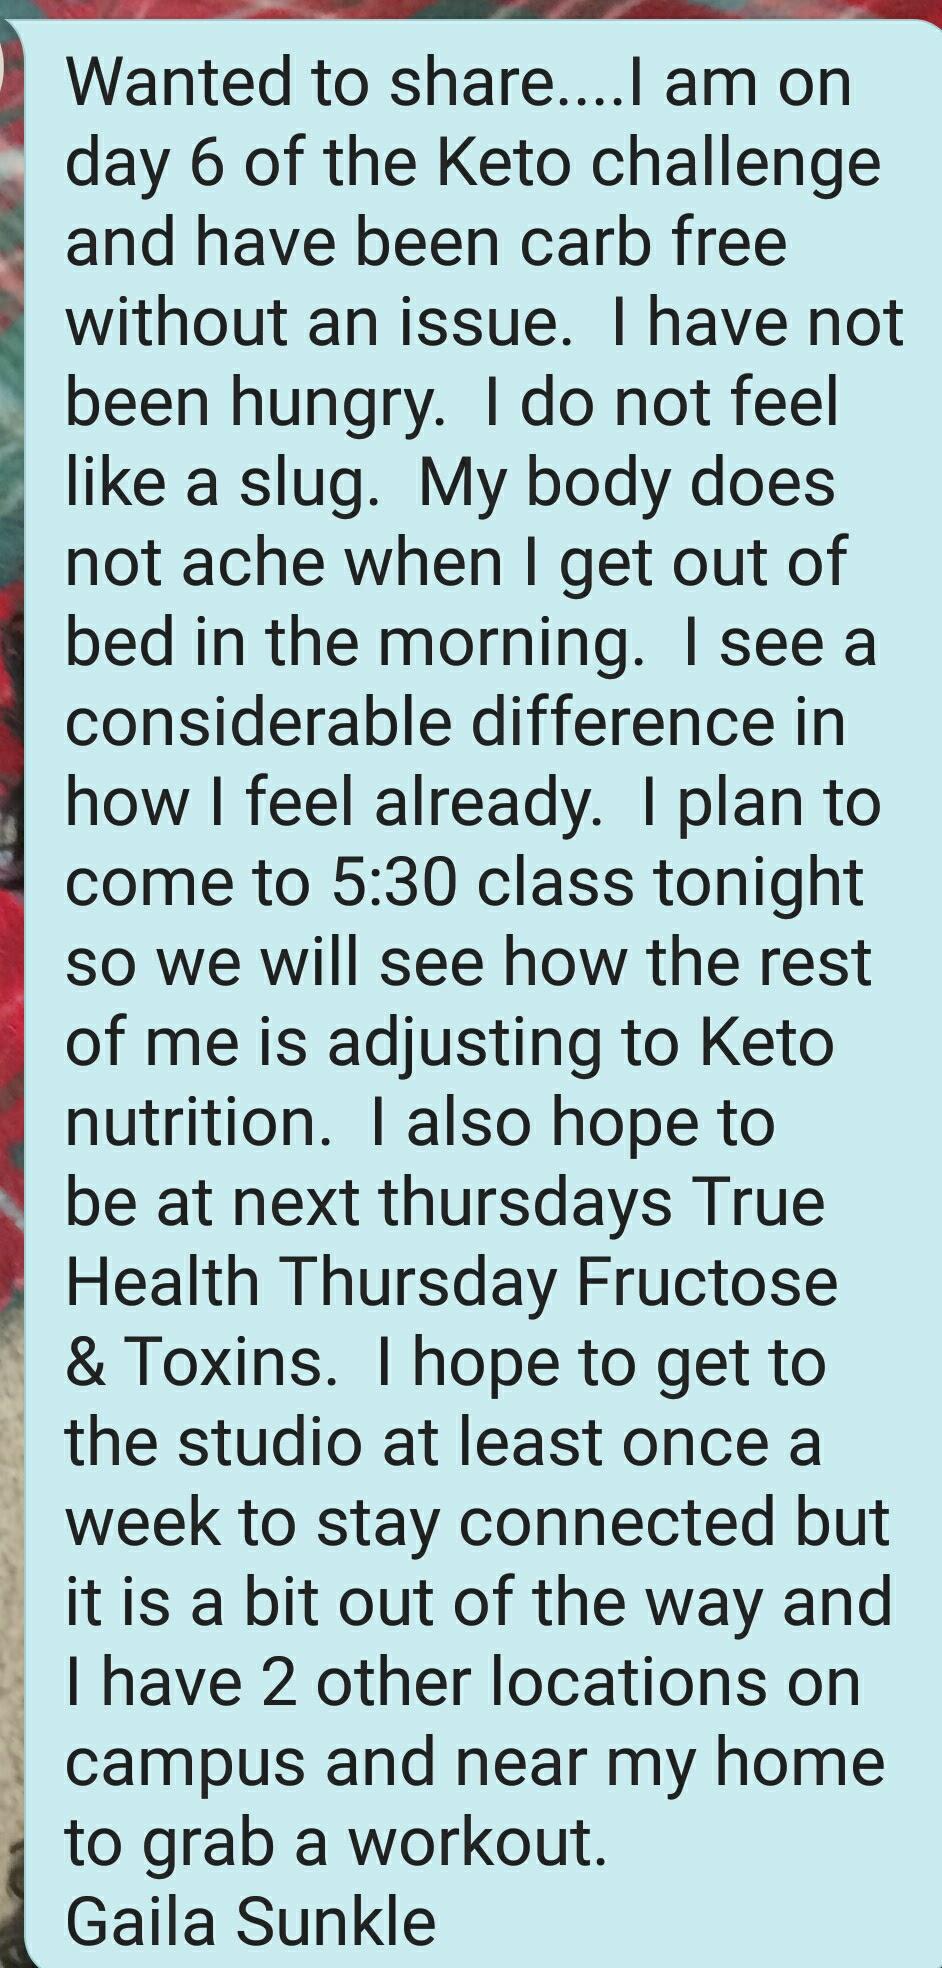 Gaila Sunkle Ketogenic Diet testimonial